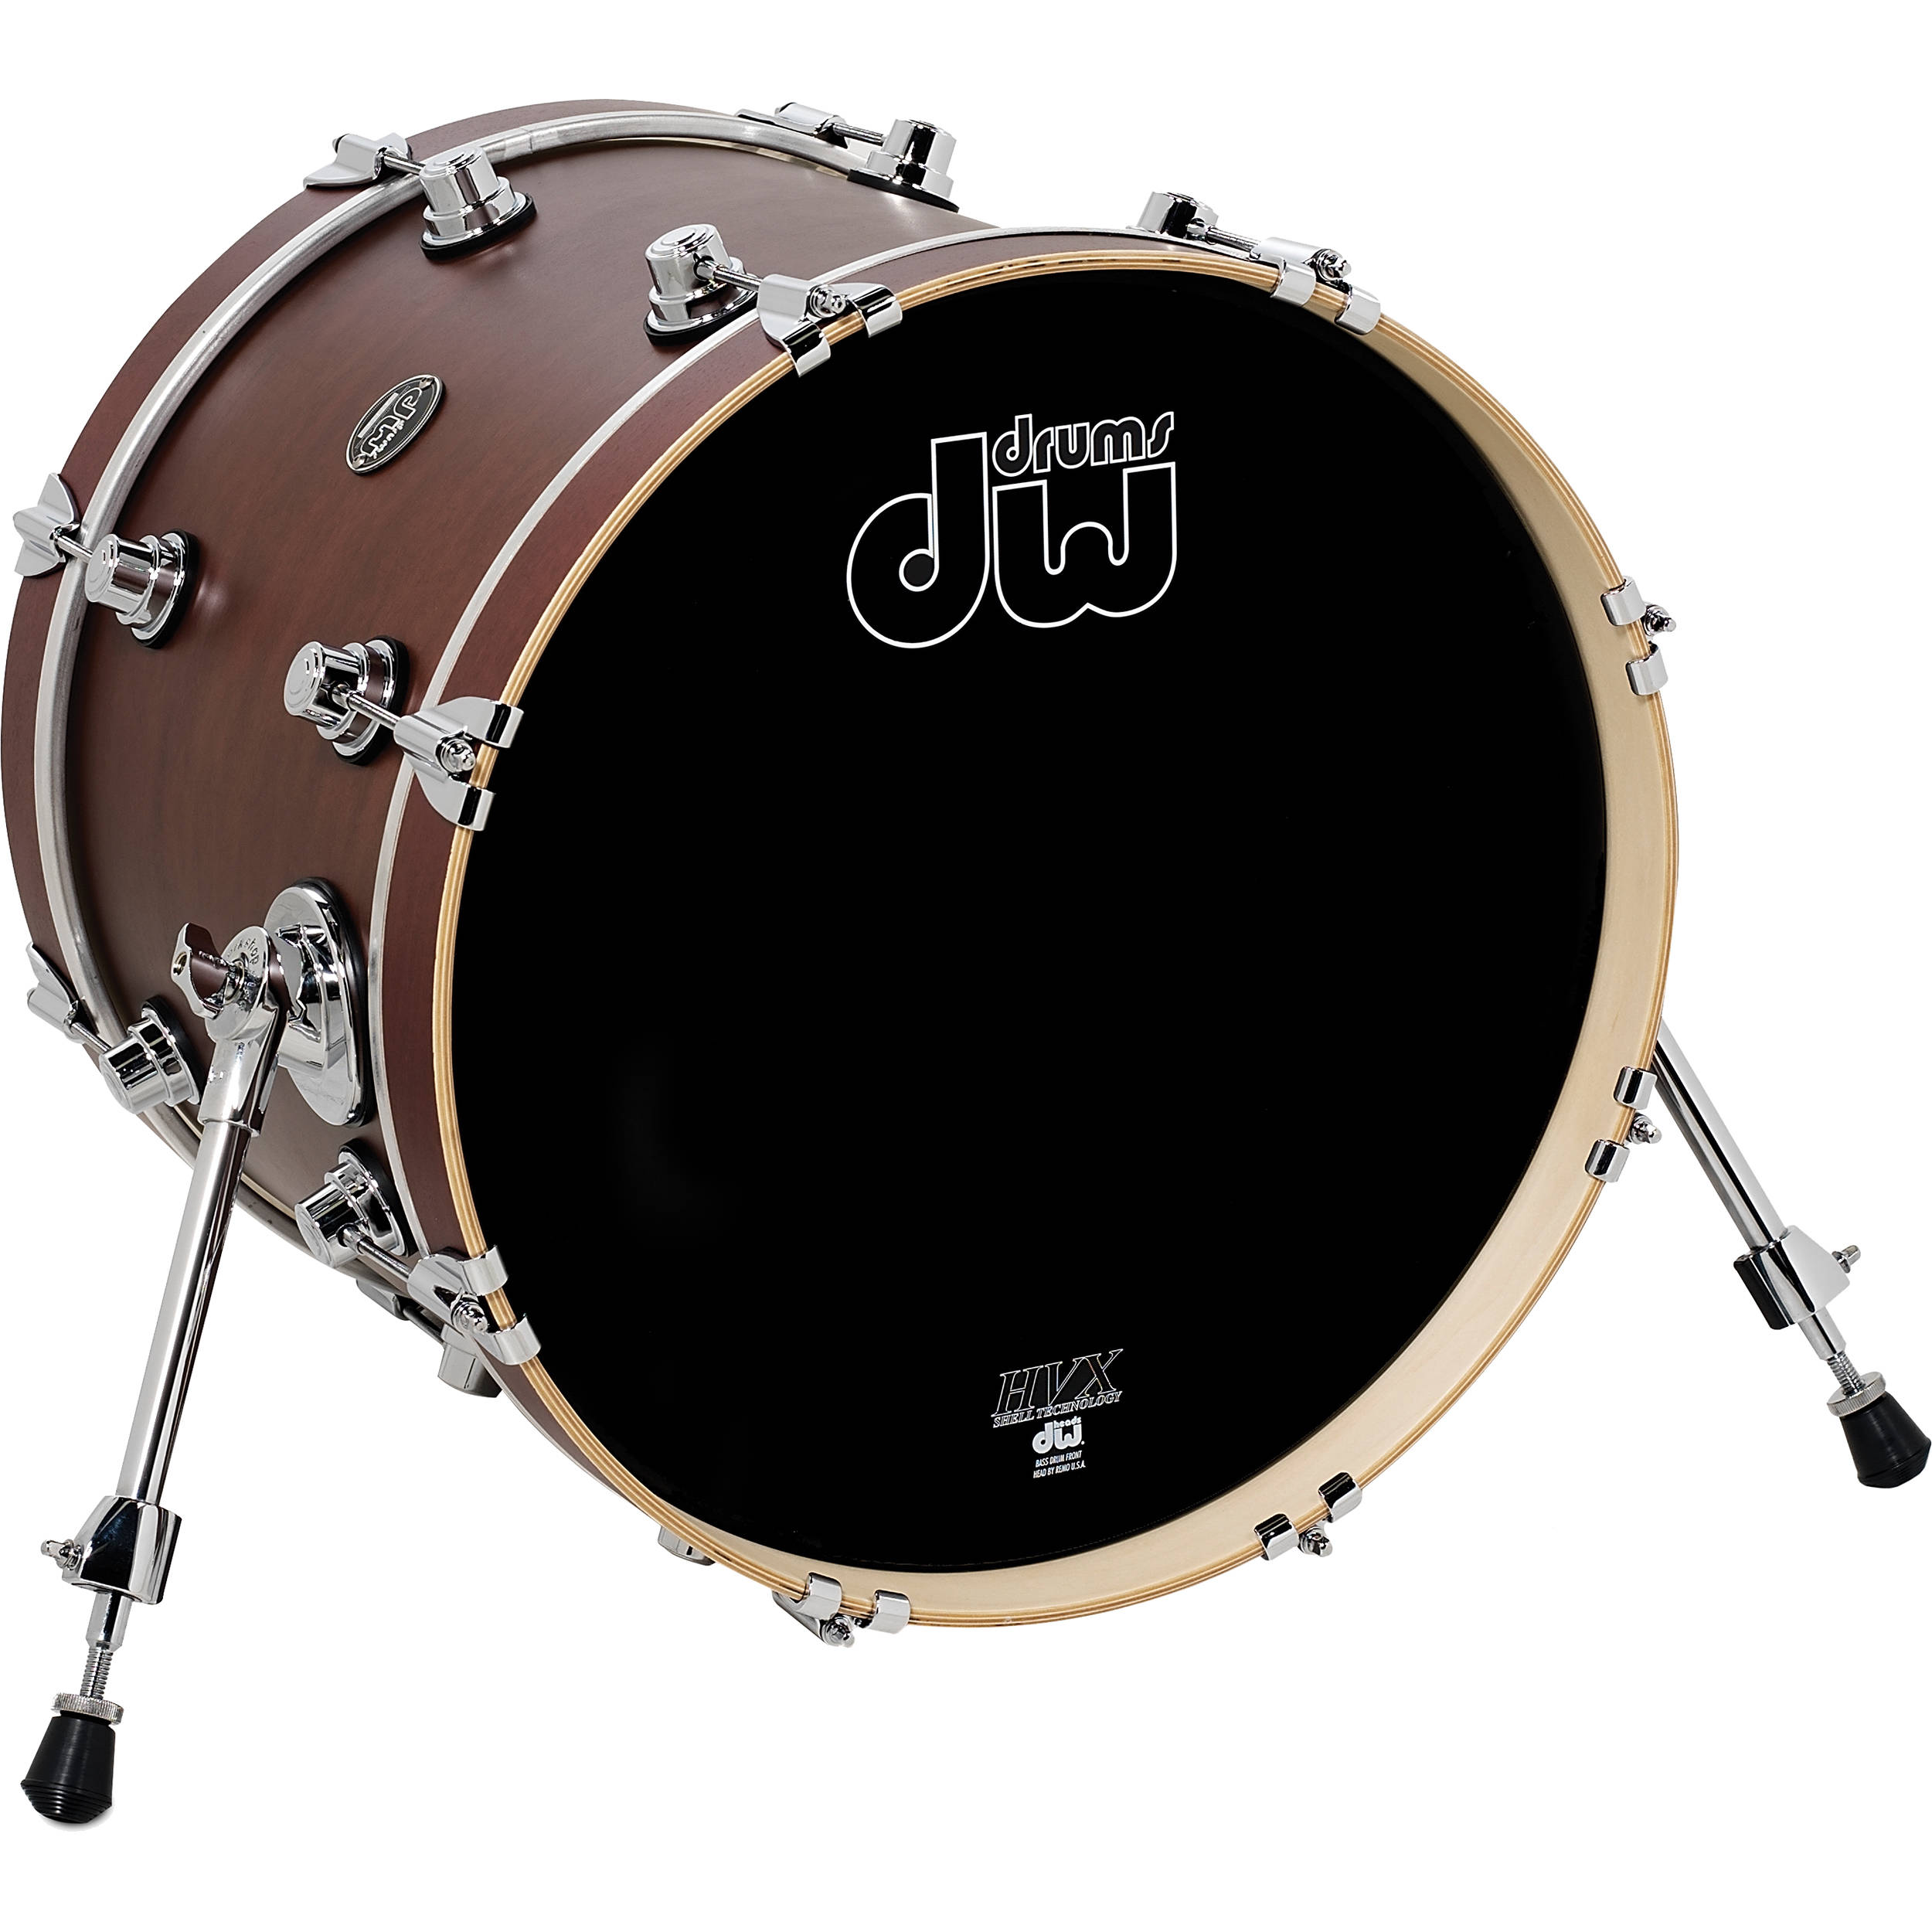 dw drums performance series 14 x 18 kick drum drps1418kktb. Black Bedroom Furniture Sets. Home Design Ideas